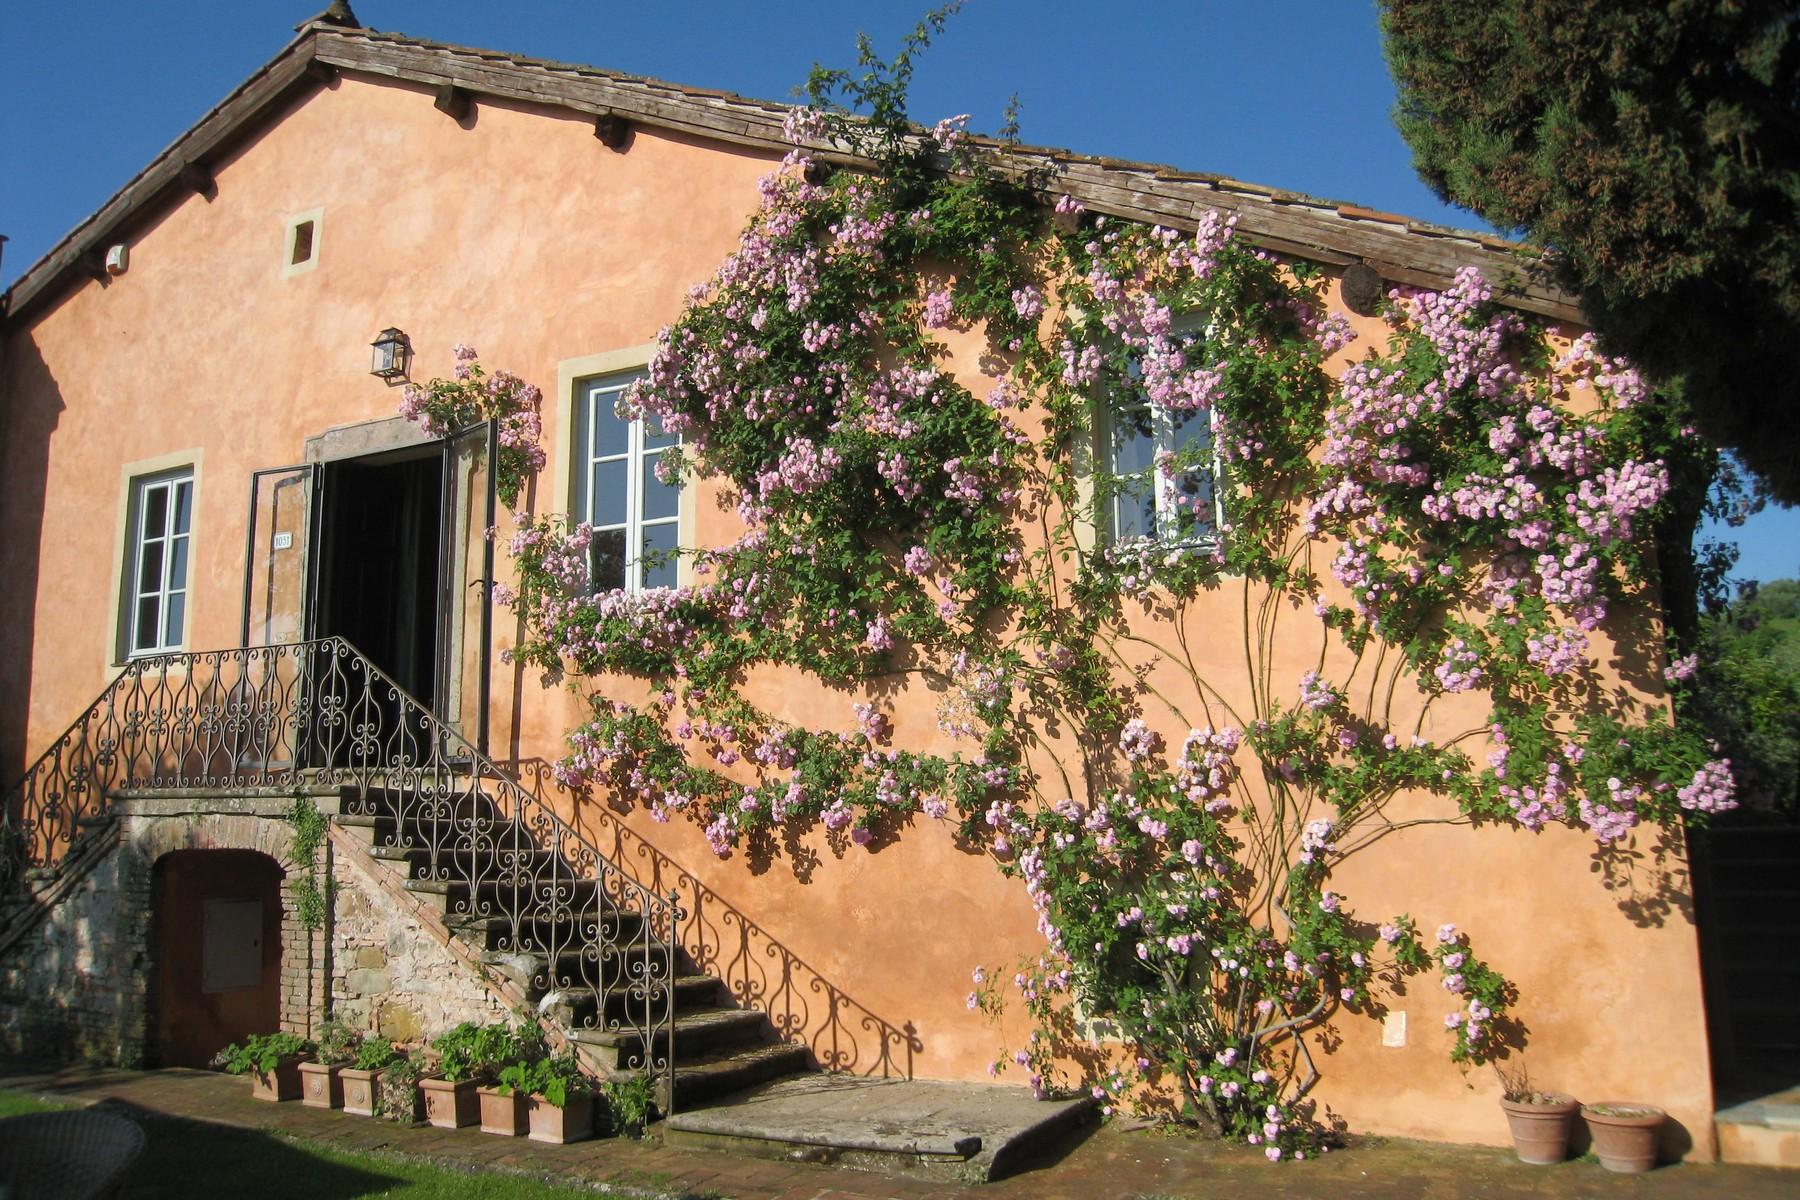 Rustico in Vendita a Lucca: 5 locali, 540 mq - Foto 2